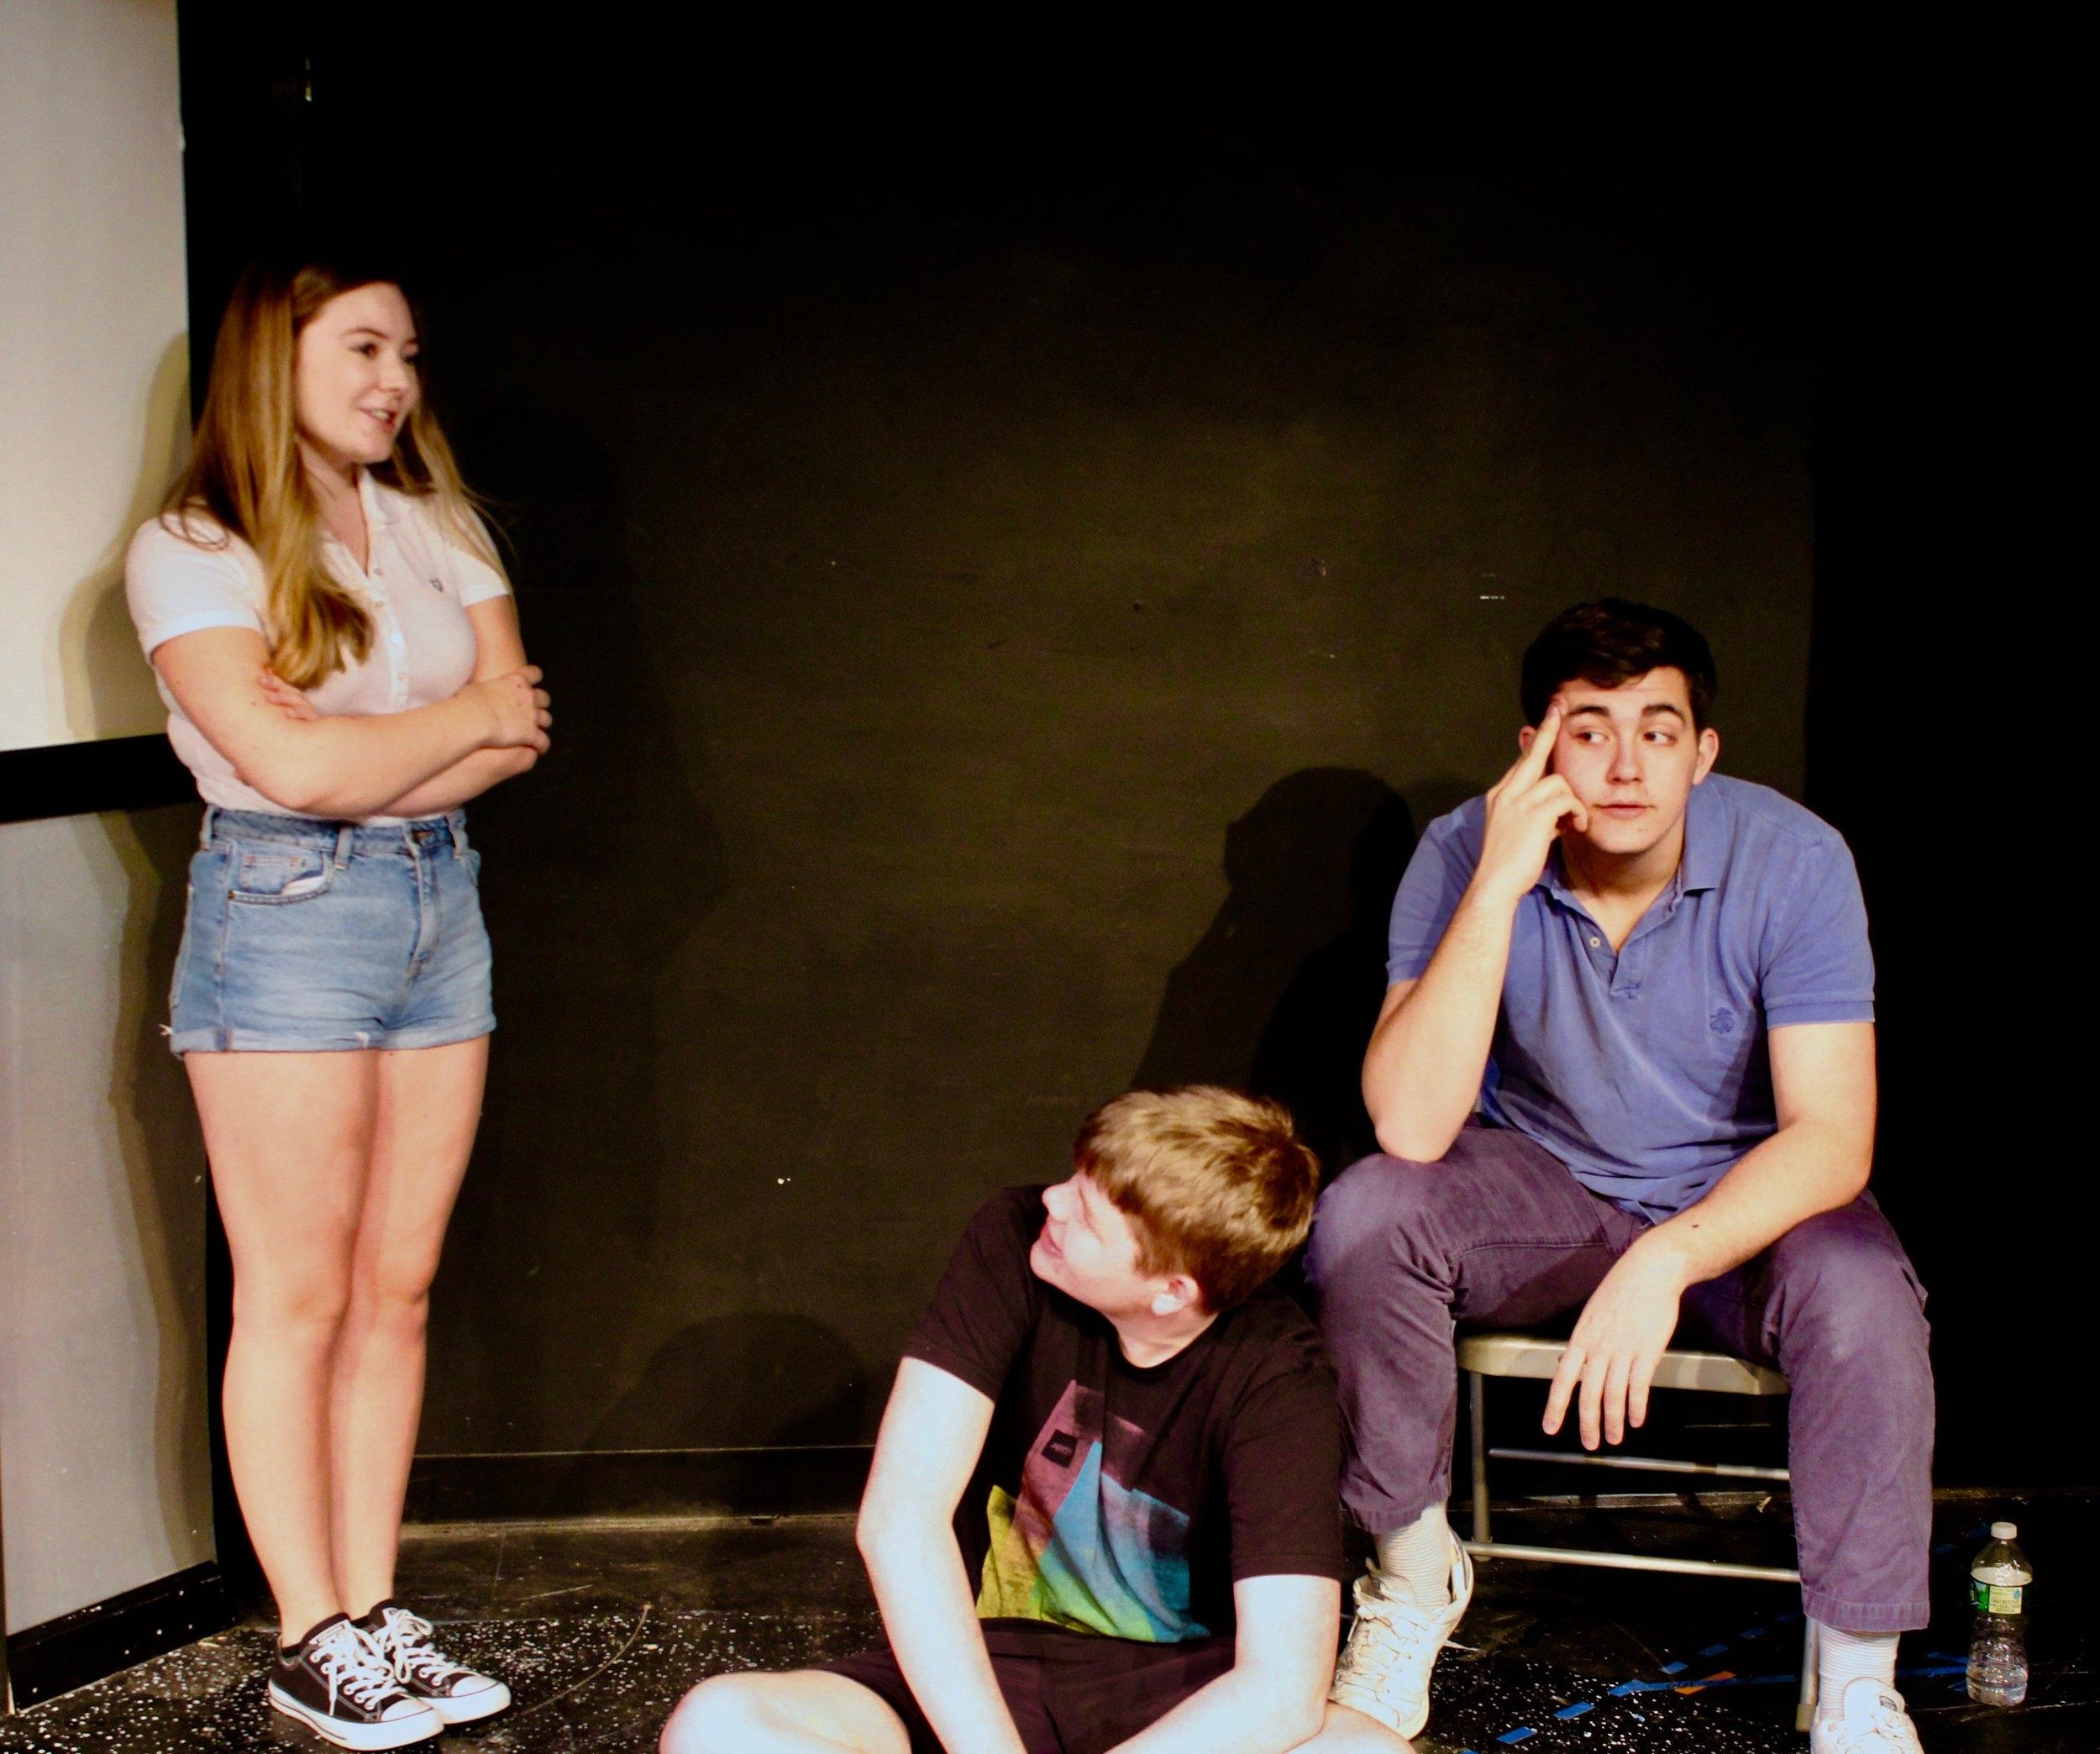 From left: Caitlin Ladda as Sarah, Patrick Napolitano as Kurtz, and Liam Gerard as Martin